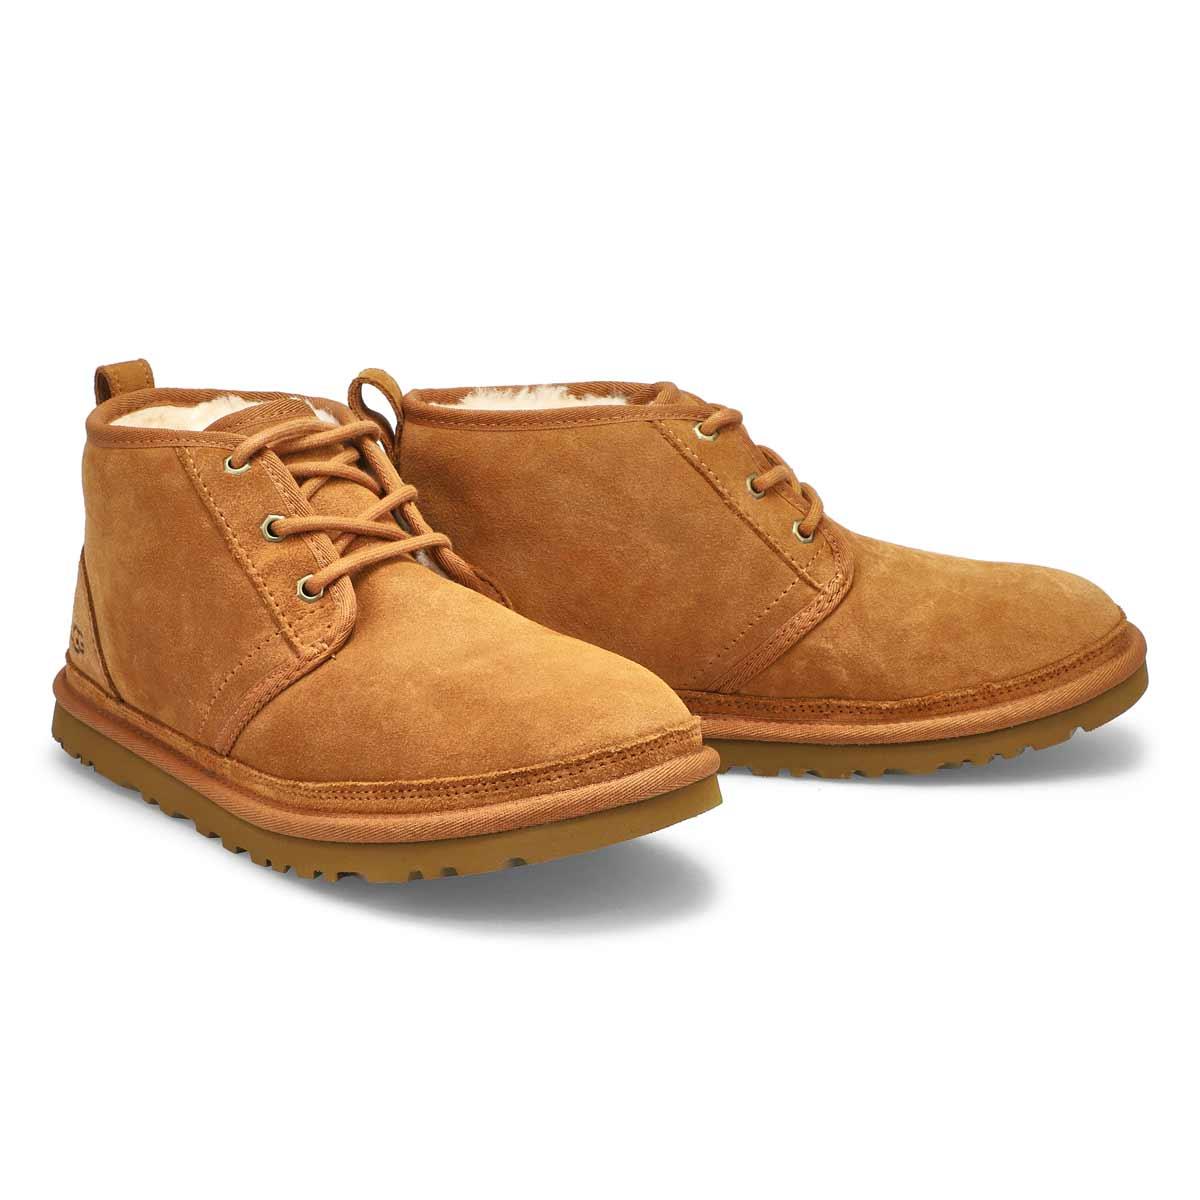 Mns Neumel chestnut lined chukka boot